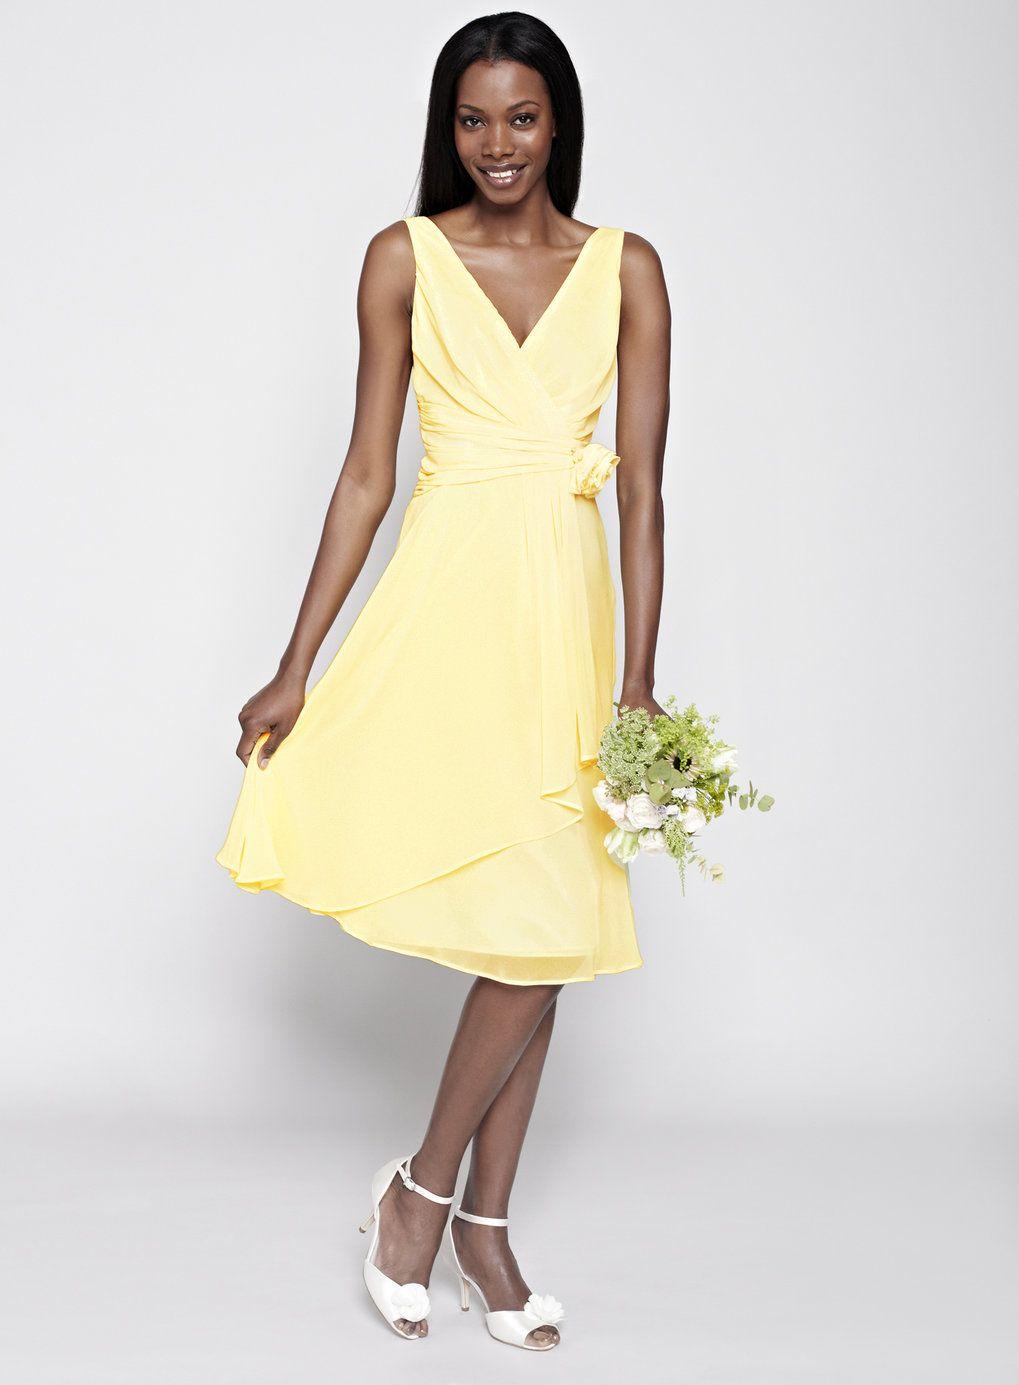 Lemon amber short bridesmaid dress bridesmaid dress ideas lemon amber short bridesmaid dress bridesmaid dress ideas ombrellifo Image collections